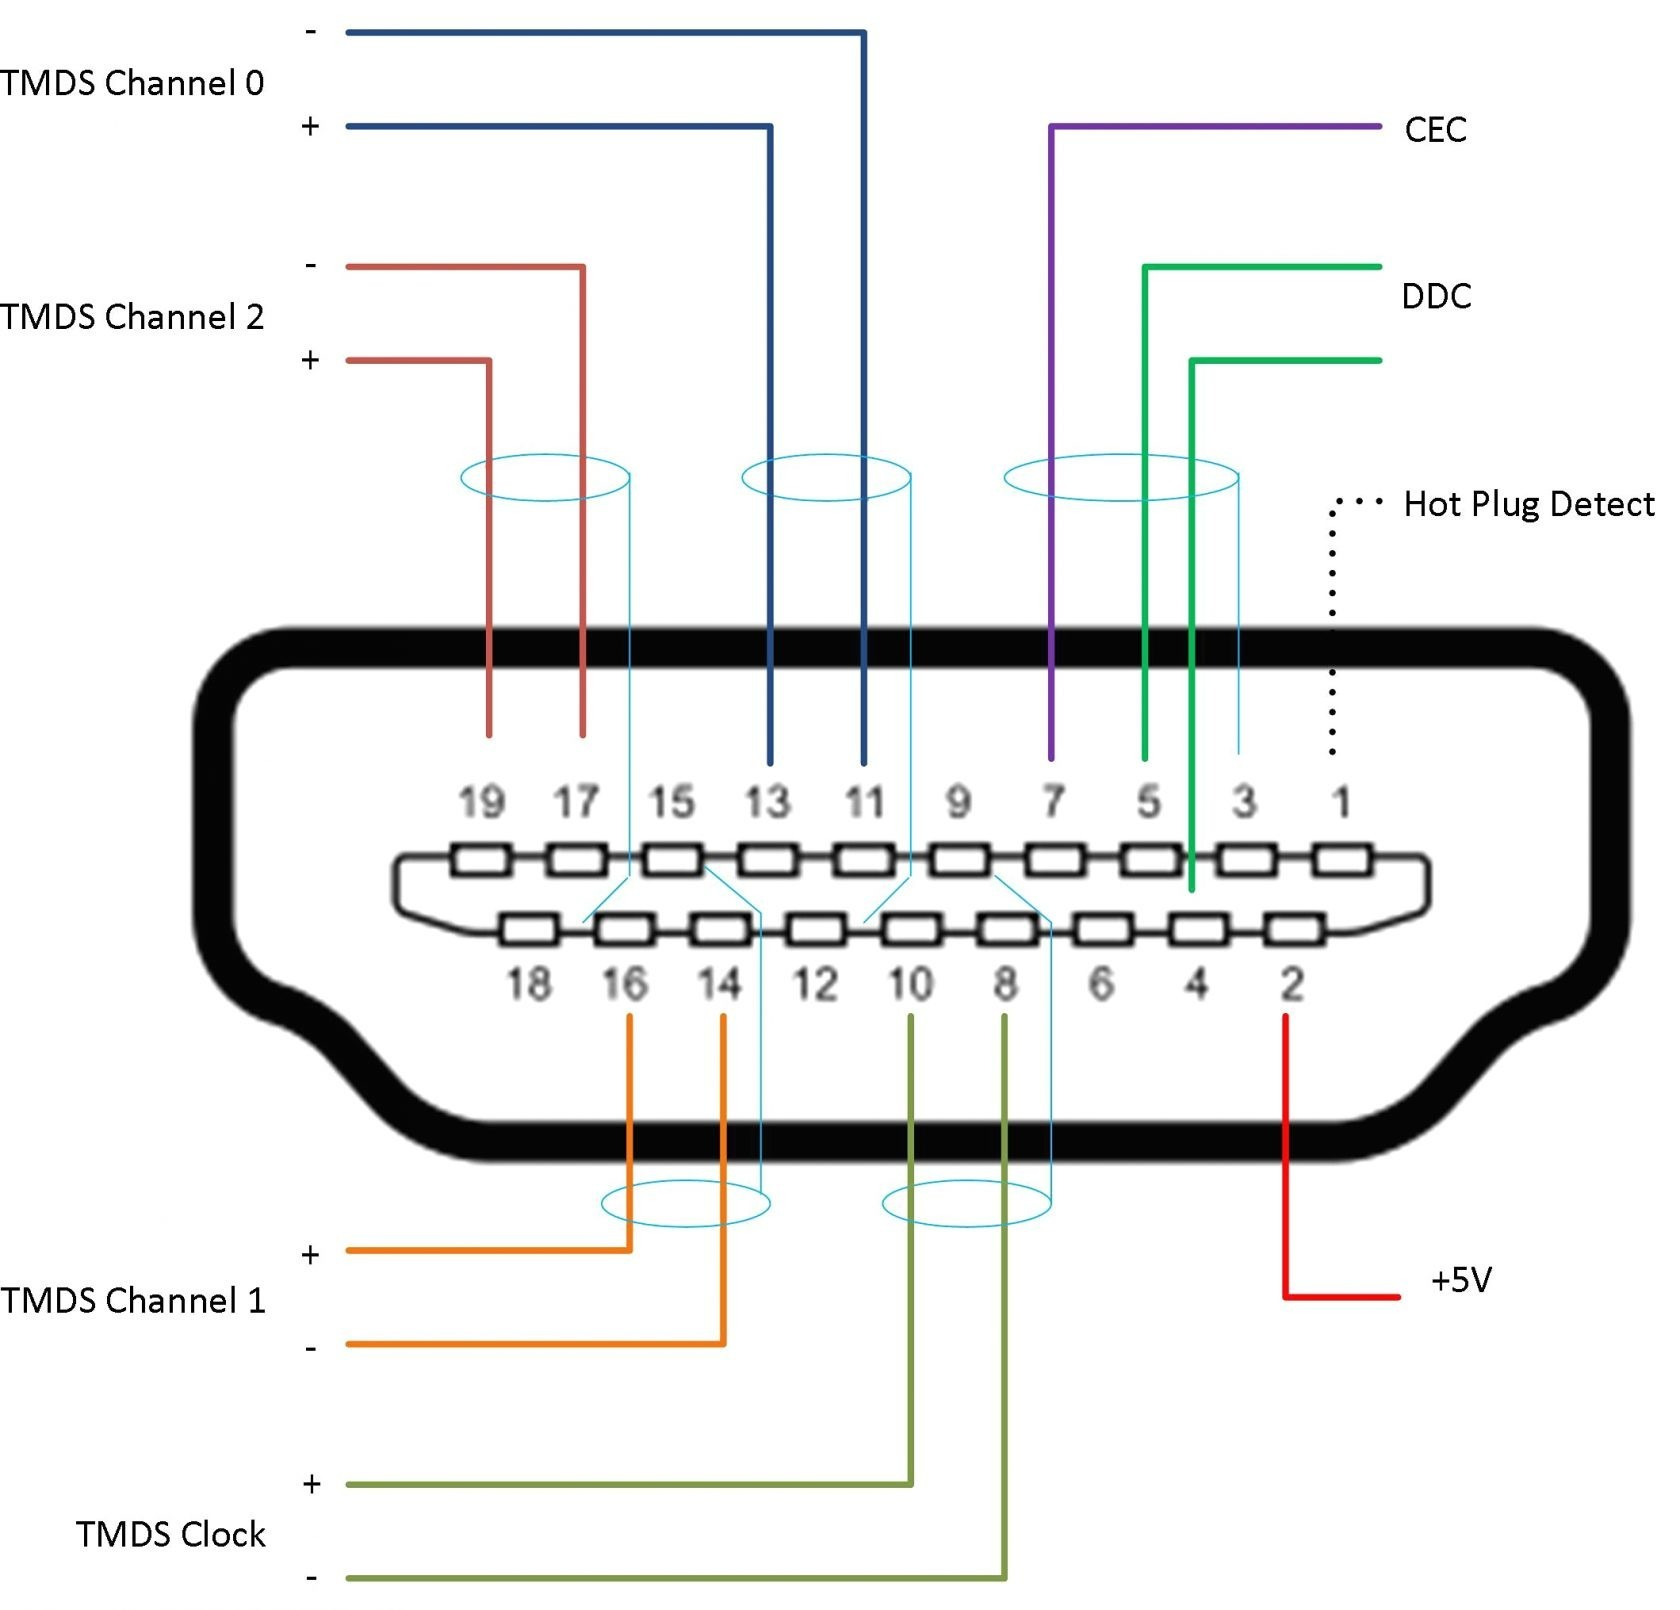 rca diagram wiring 7 2887a wiring diagram paperrca diagram wiring 7 2887a wiring diagrams konsult rca